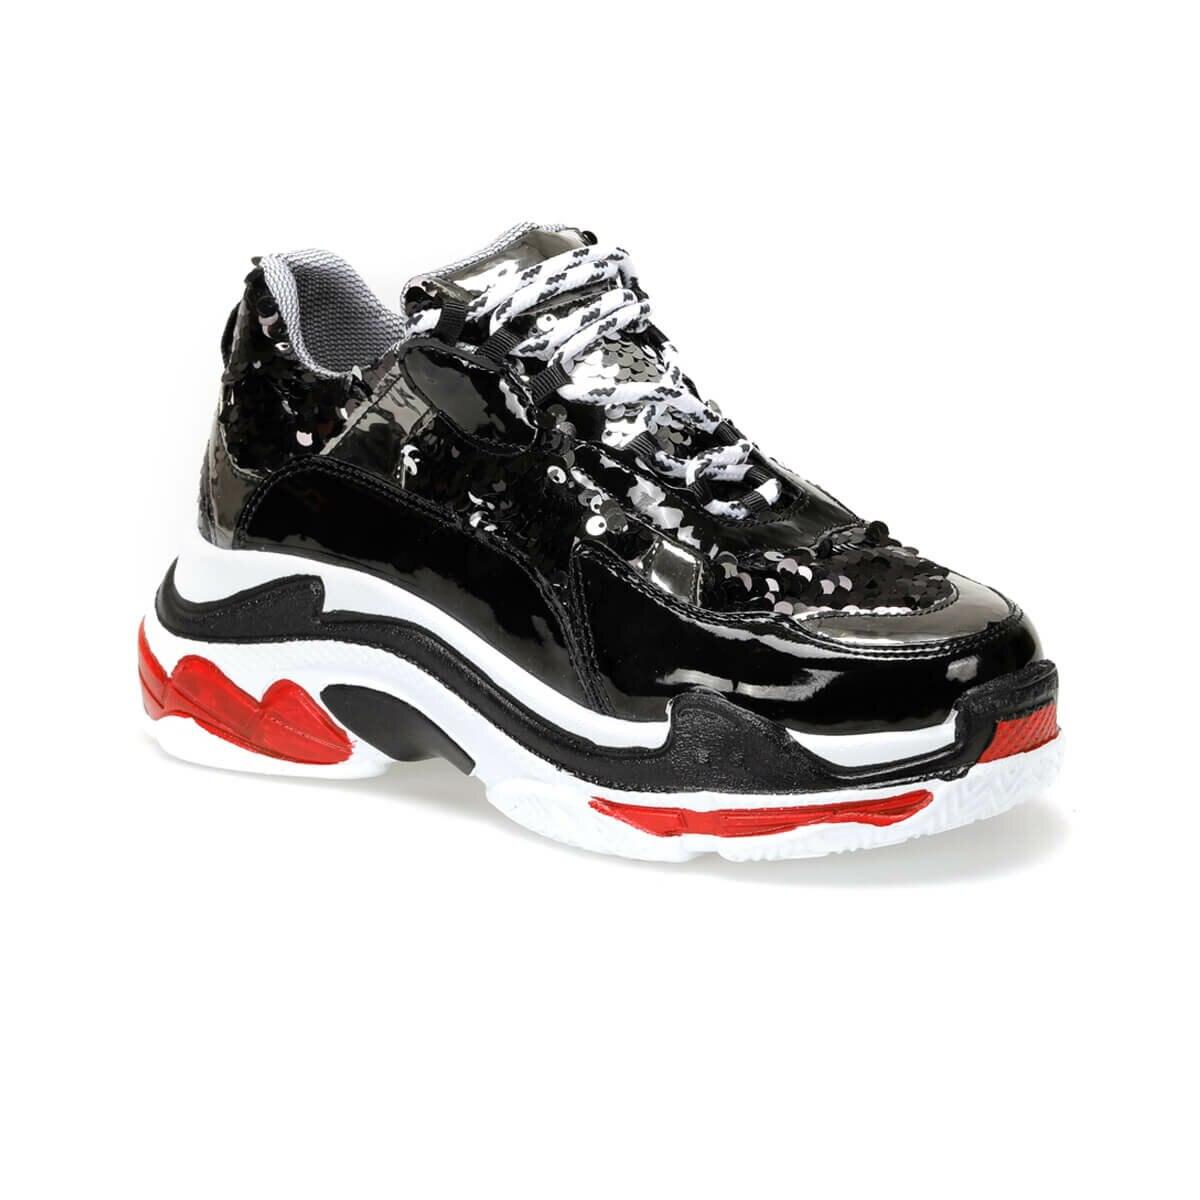 FLO LUPIN85Z PATENT LEATHER Black Women 'S Sneaker Shoes BUTIGO